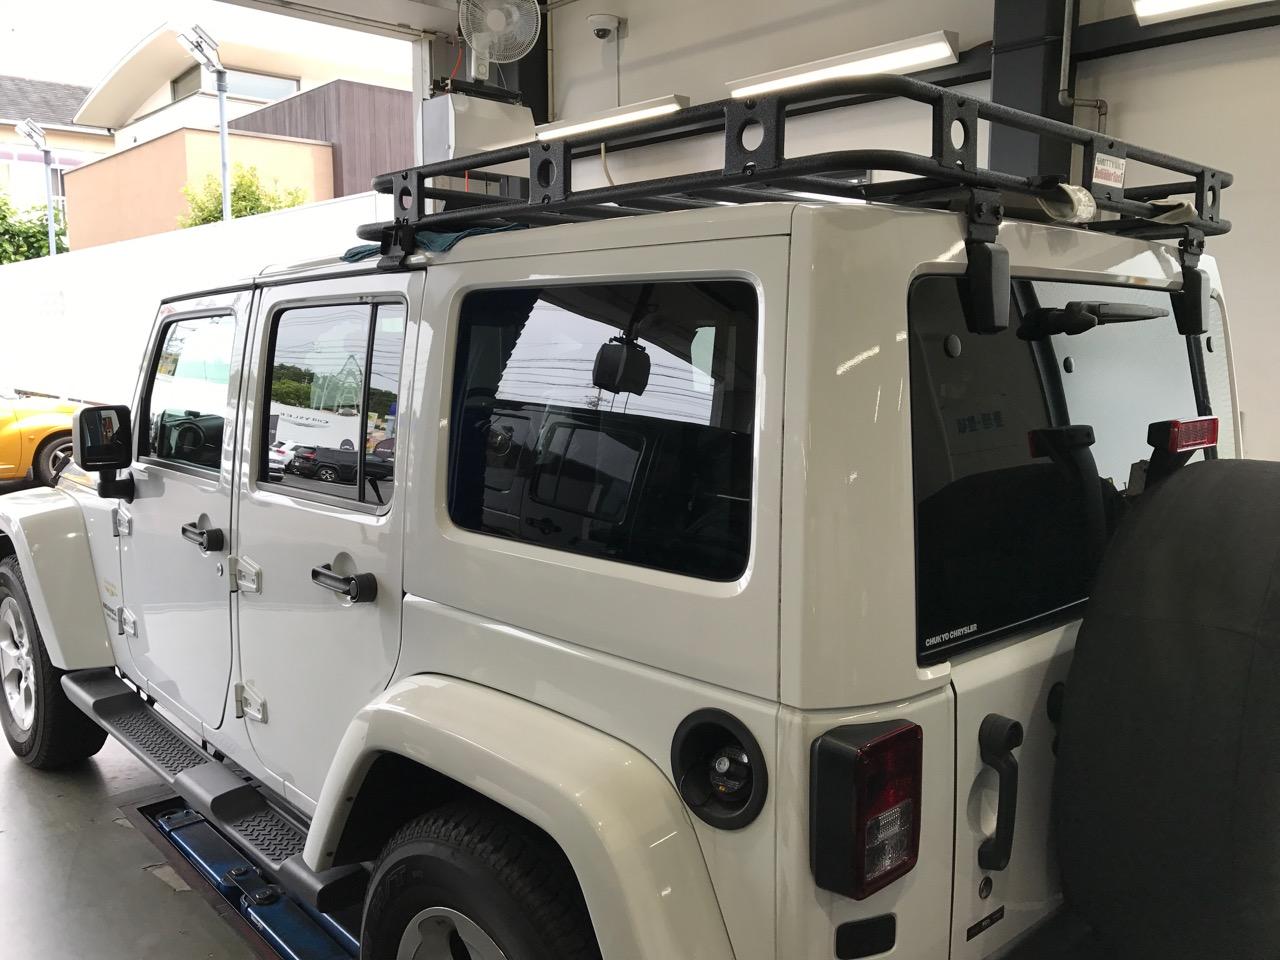 Smittybilt jeep